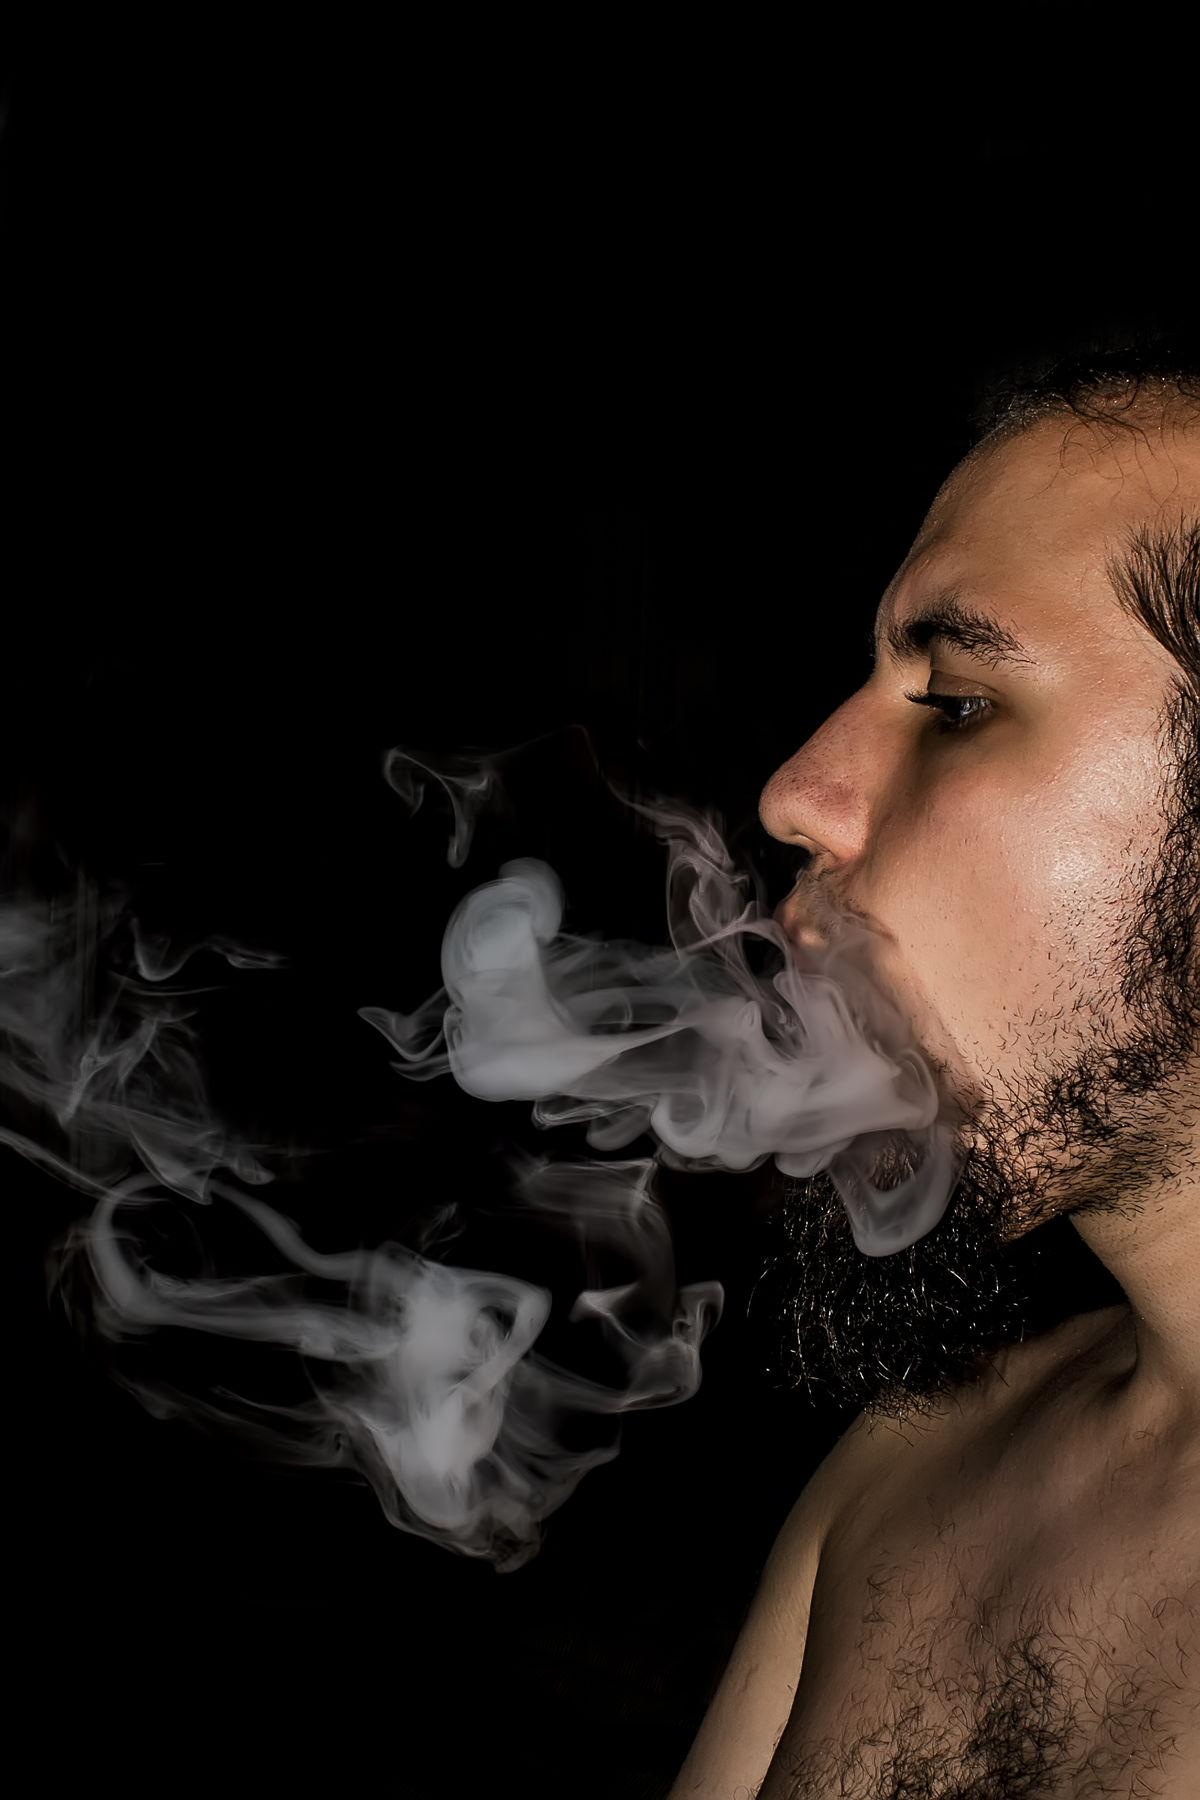 Smoke Black Background Lifestyles One Person Portrait Smoke Spontenous Studio Shot Young Adult